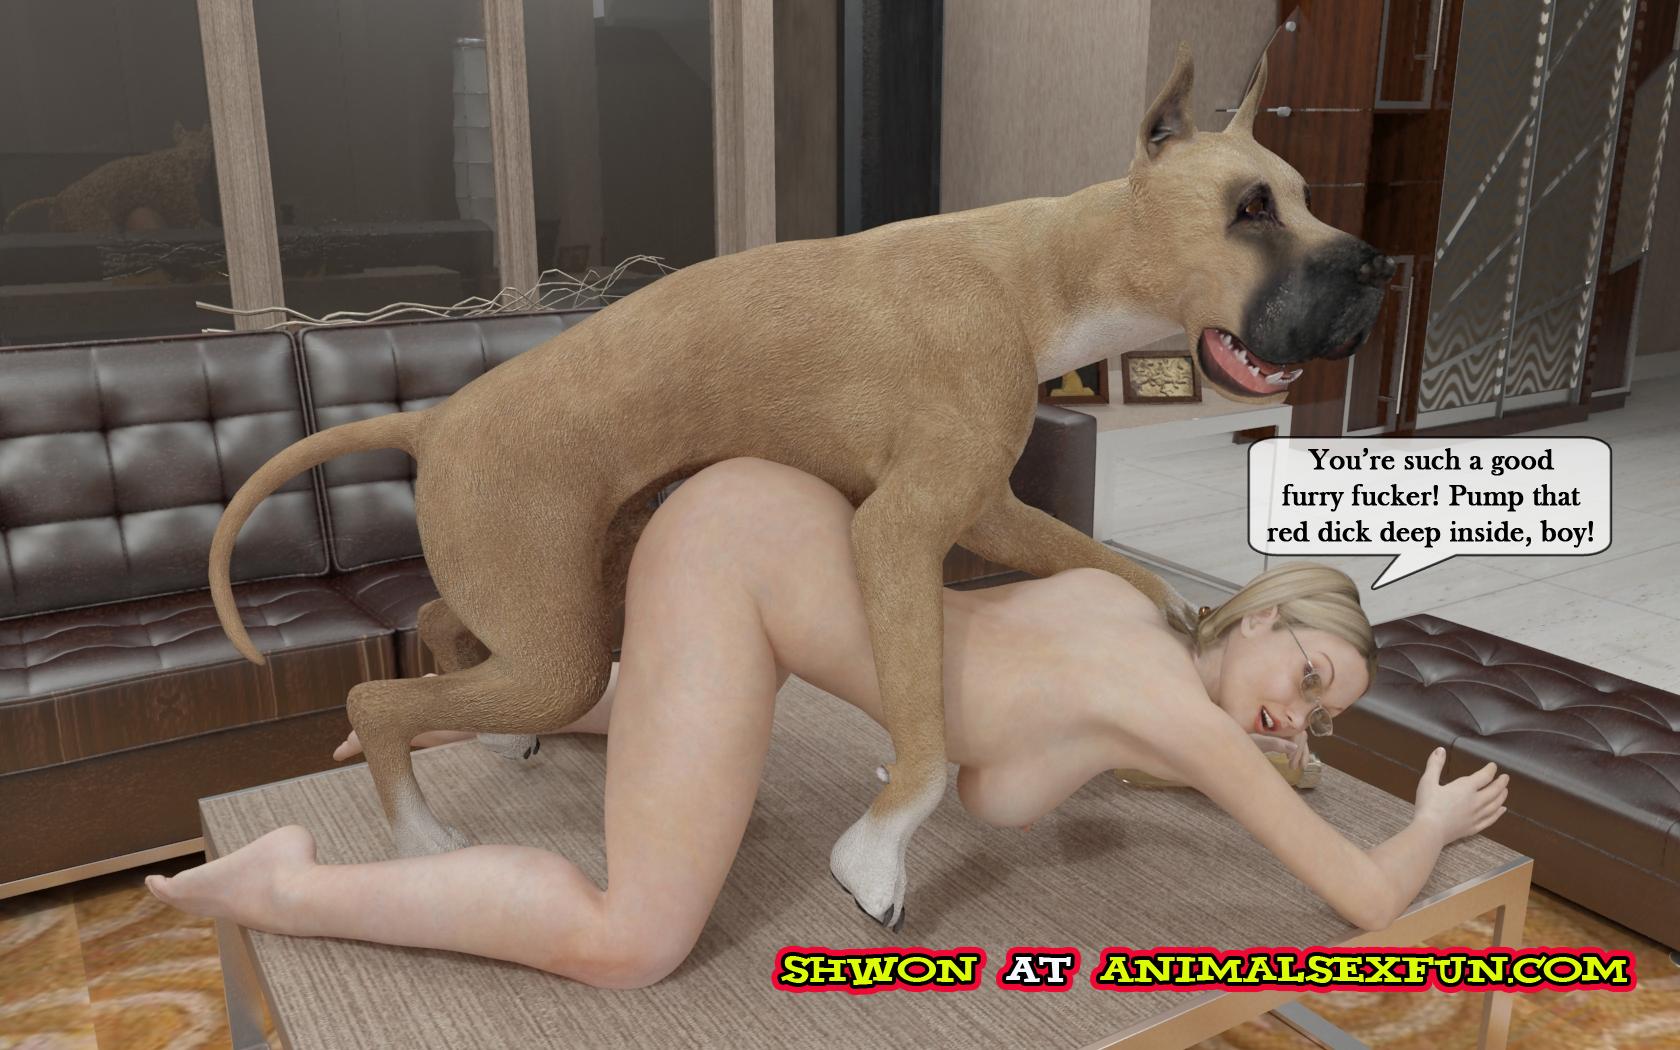 Showing Media & Posts for 3d animal sex xxx | www.veu.xxx